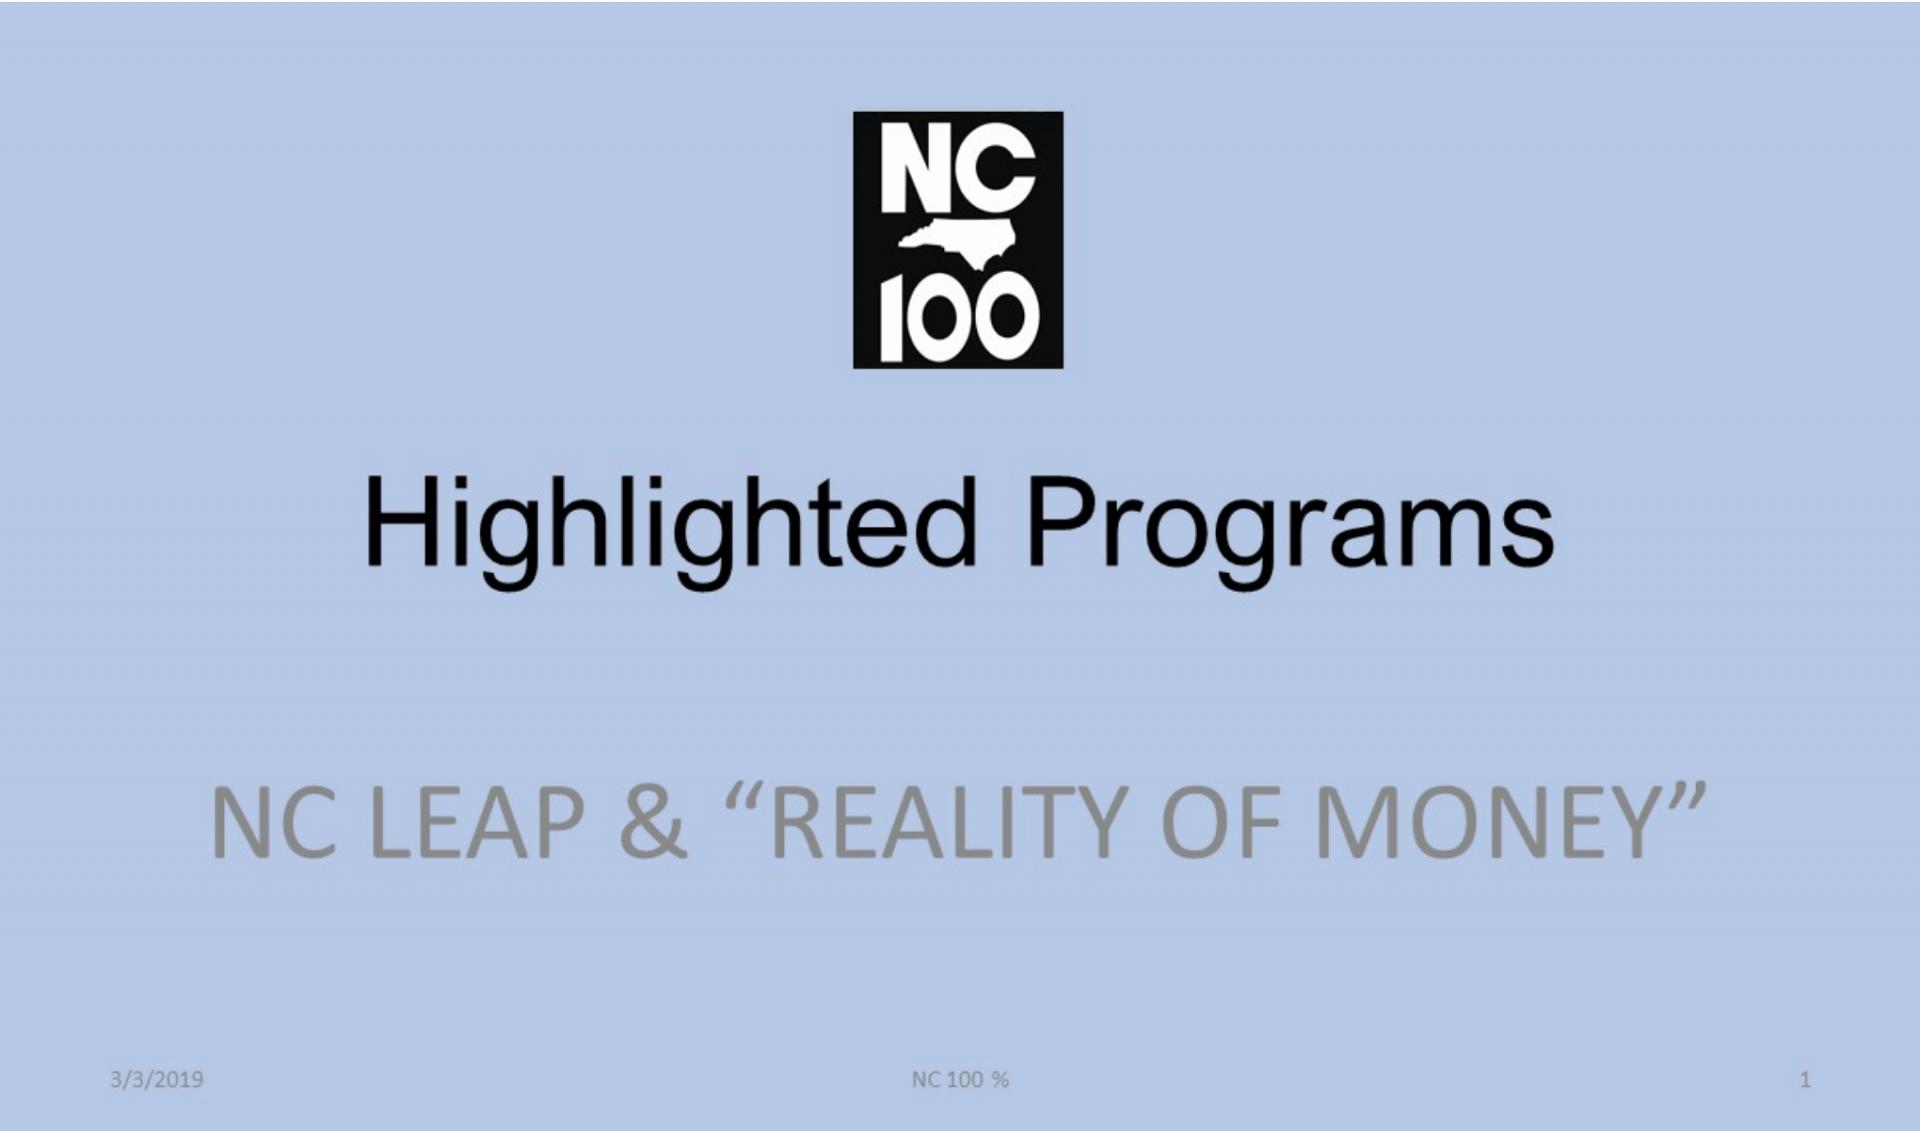 NC 100 highlighted programs